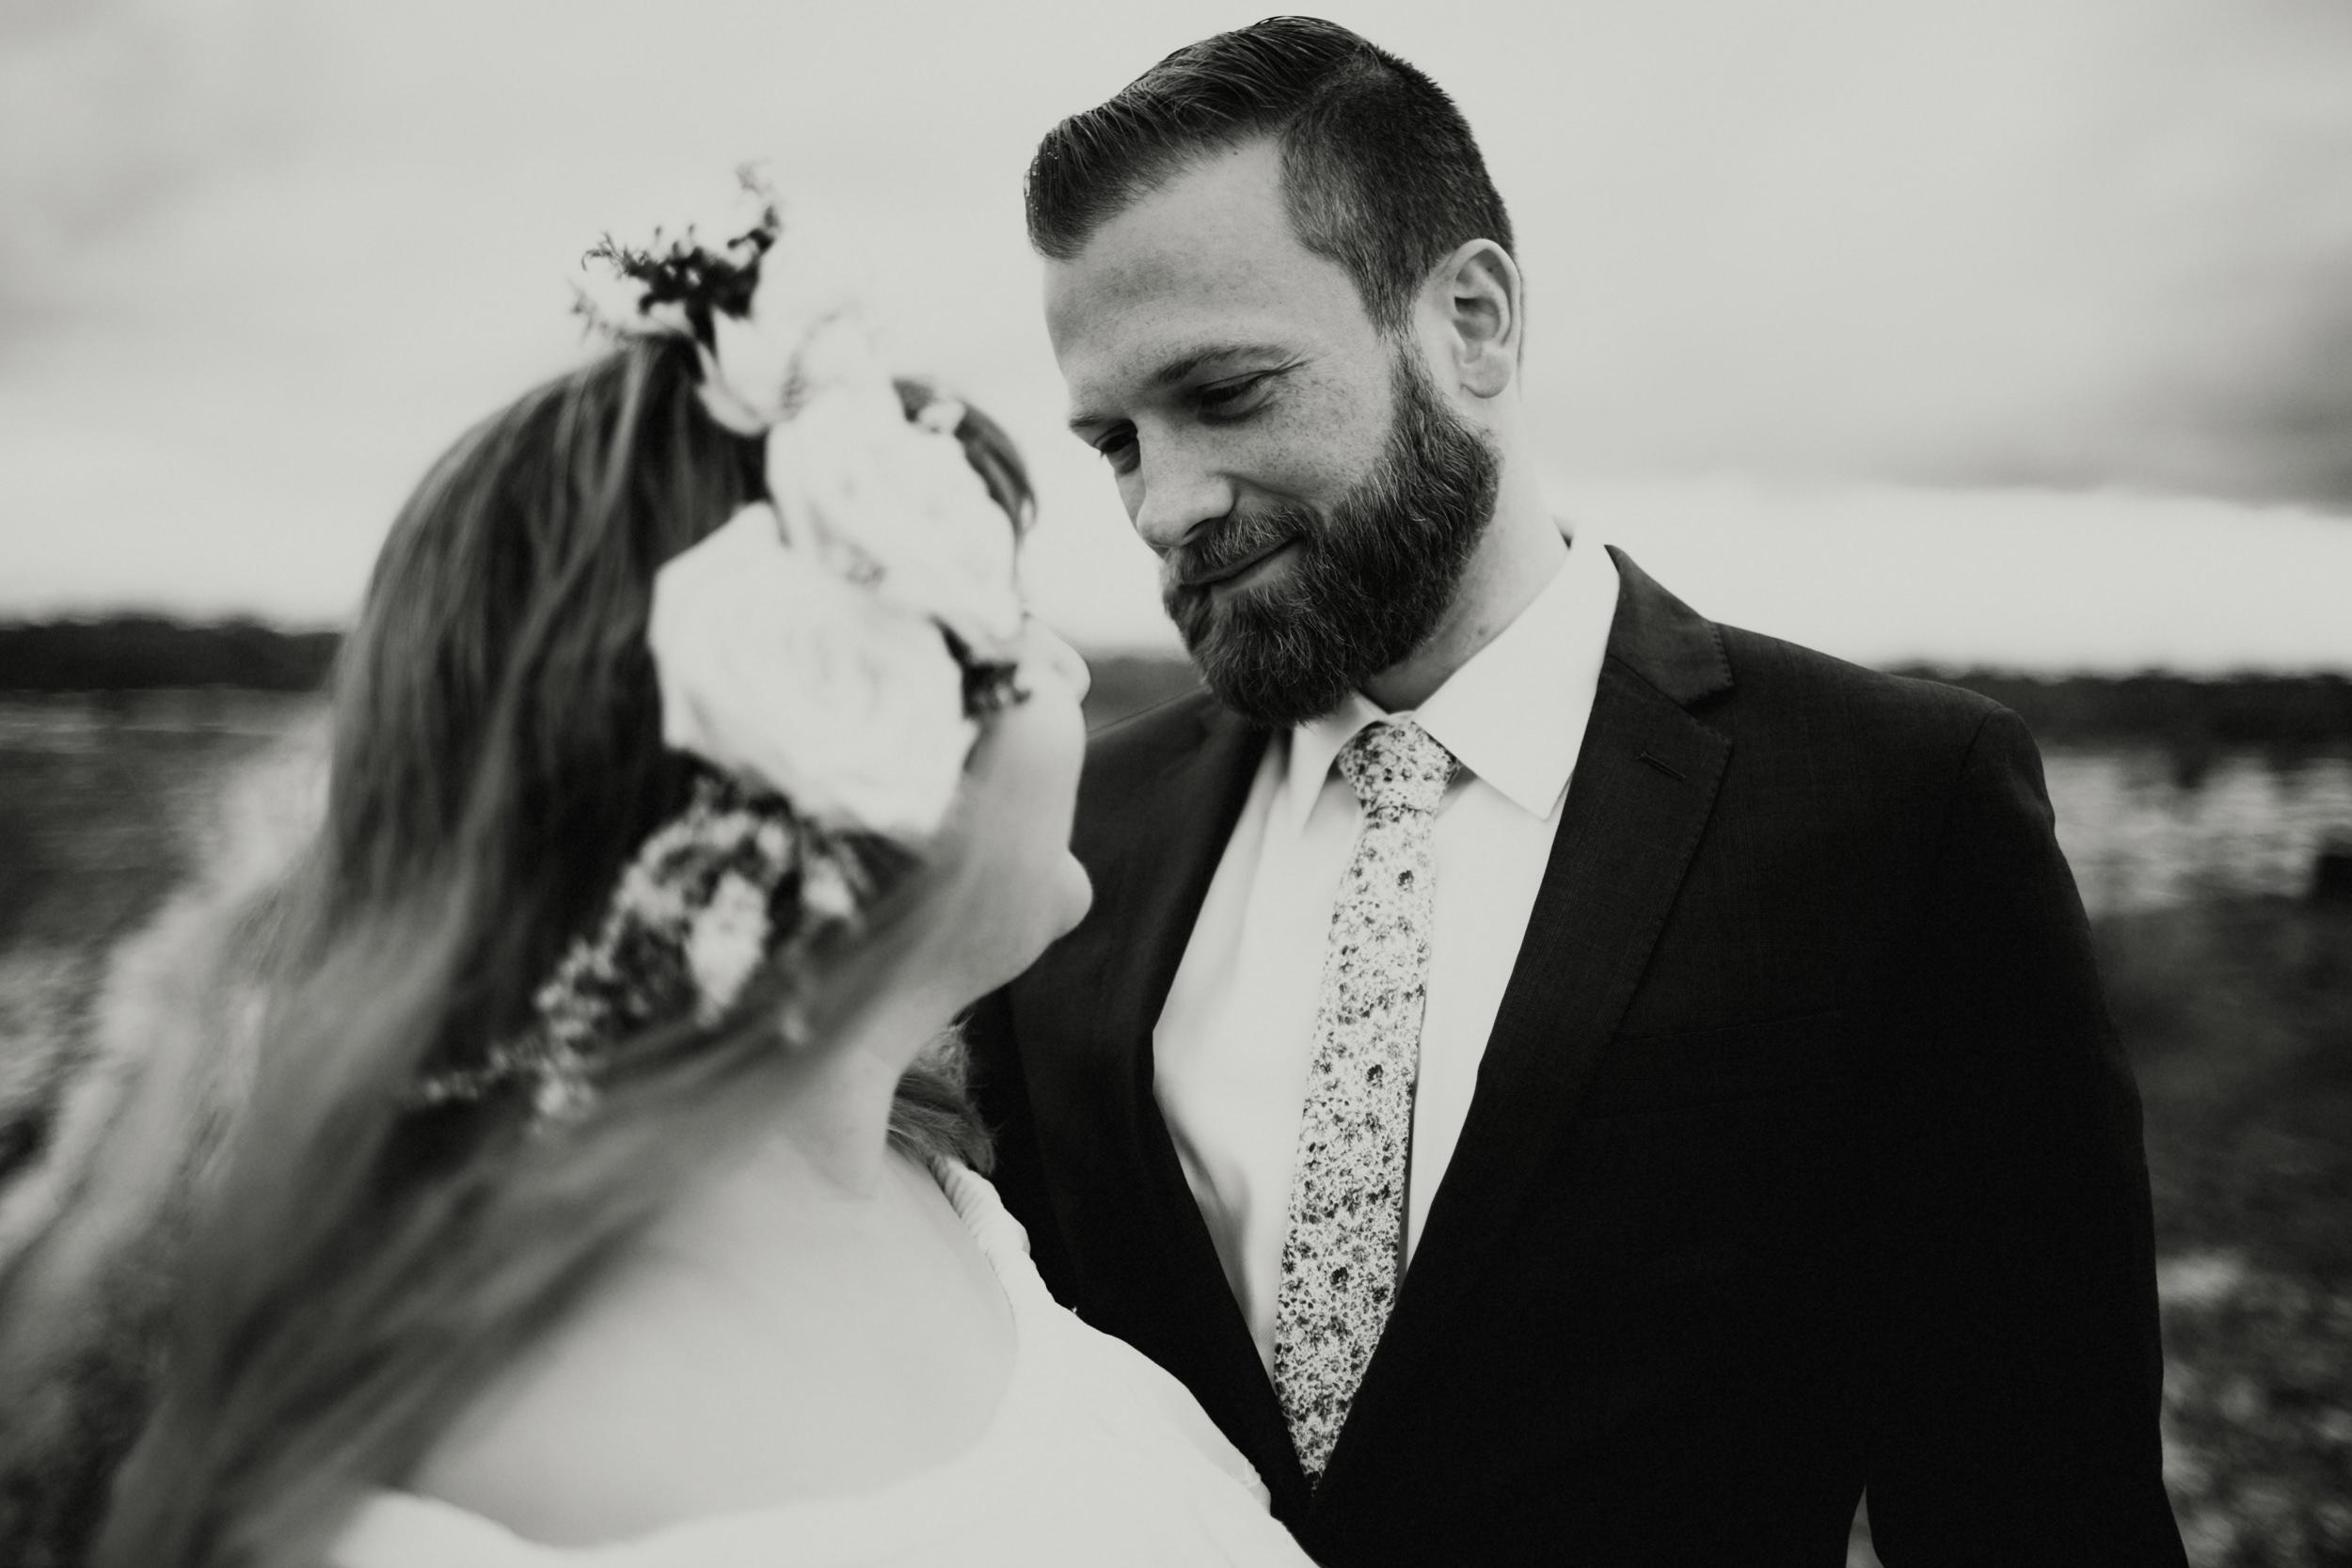 I-Got-You-Babe-Weddings-Hannah-Brent-Anniversary0007.JPG